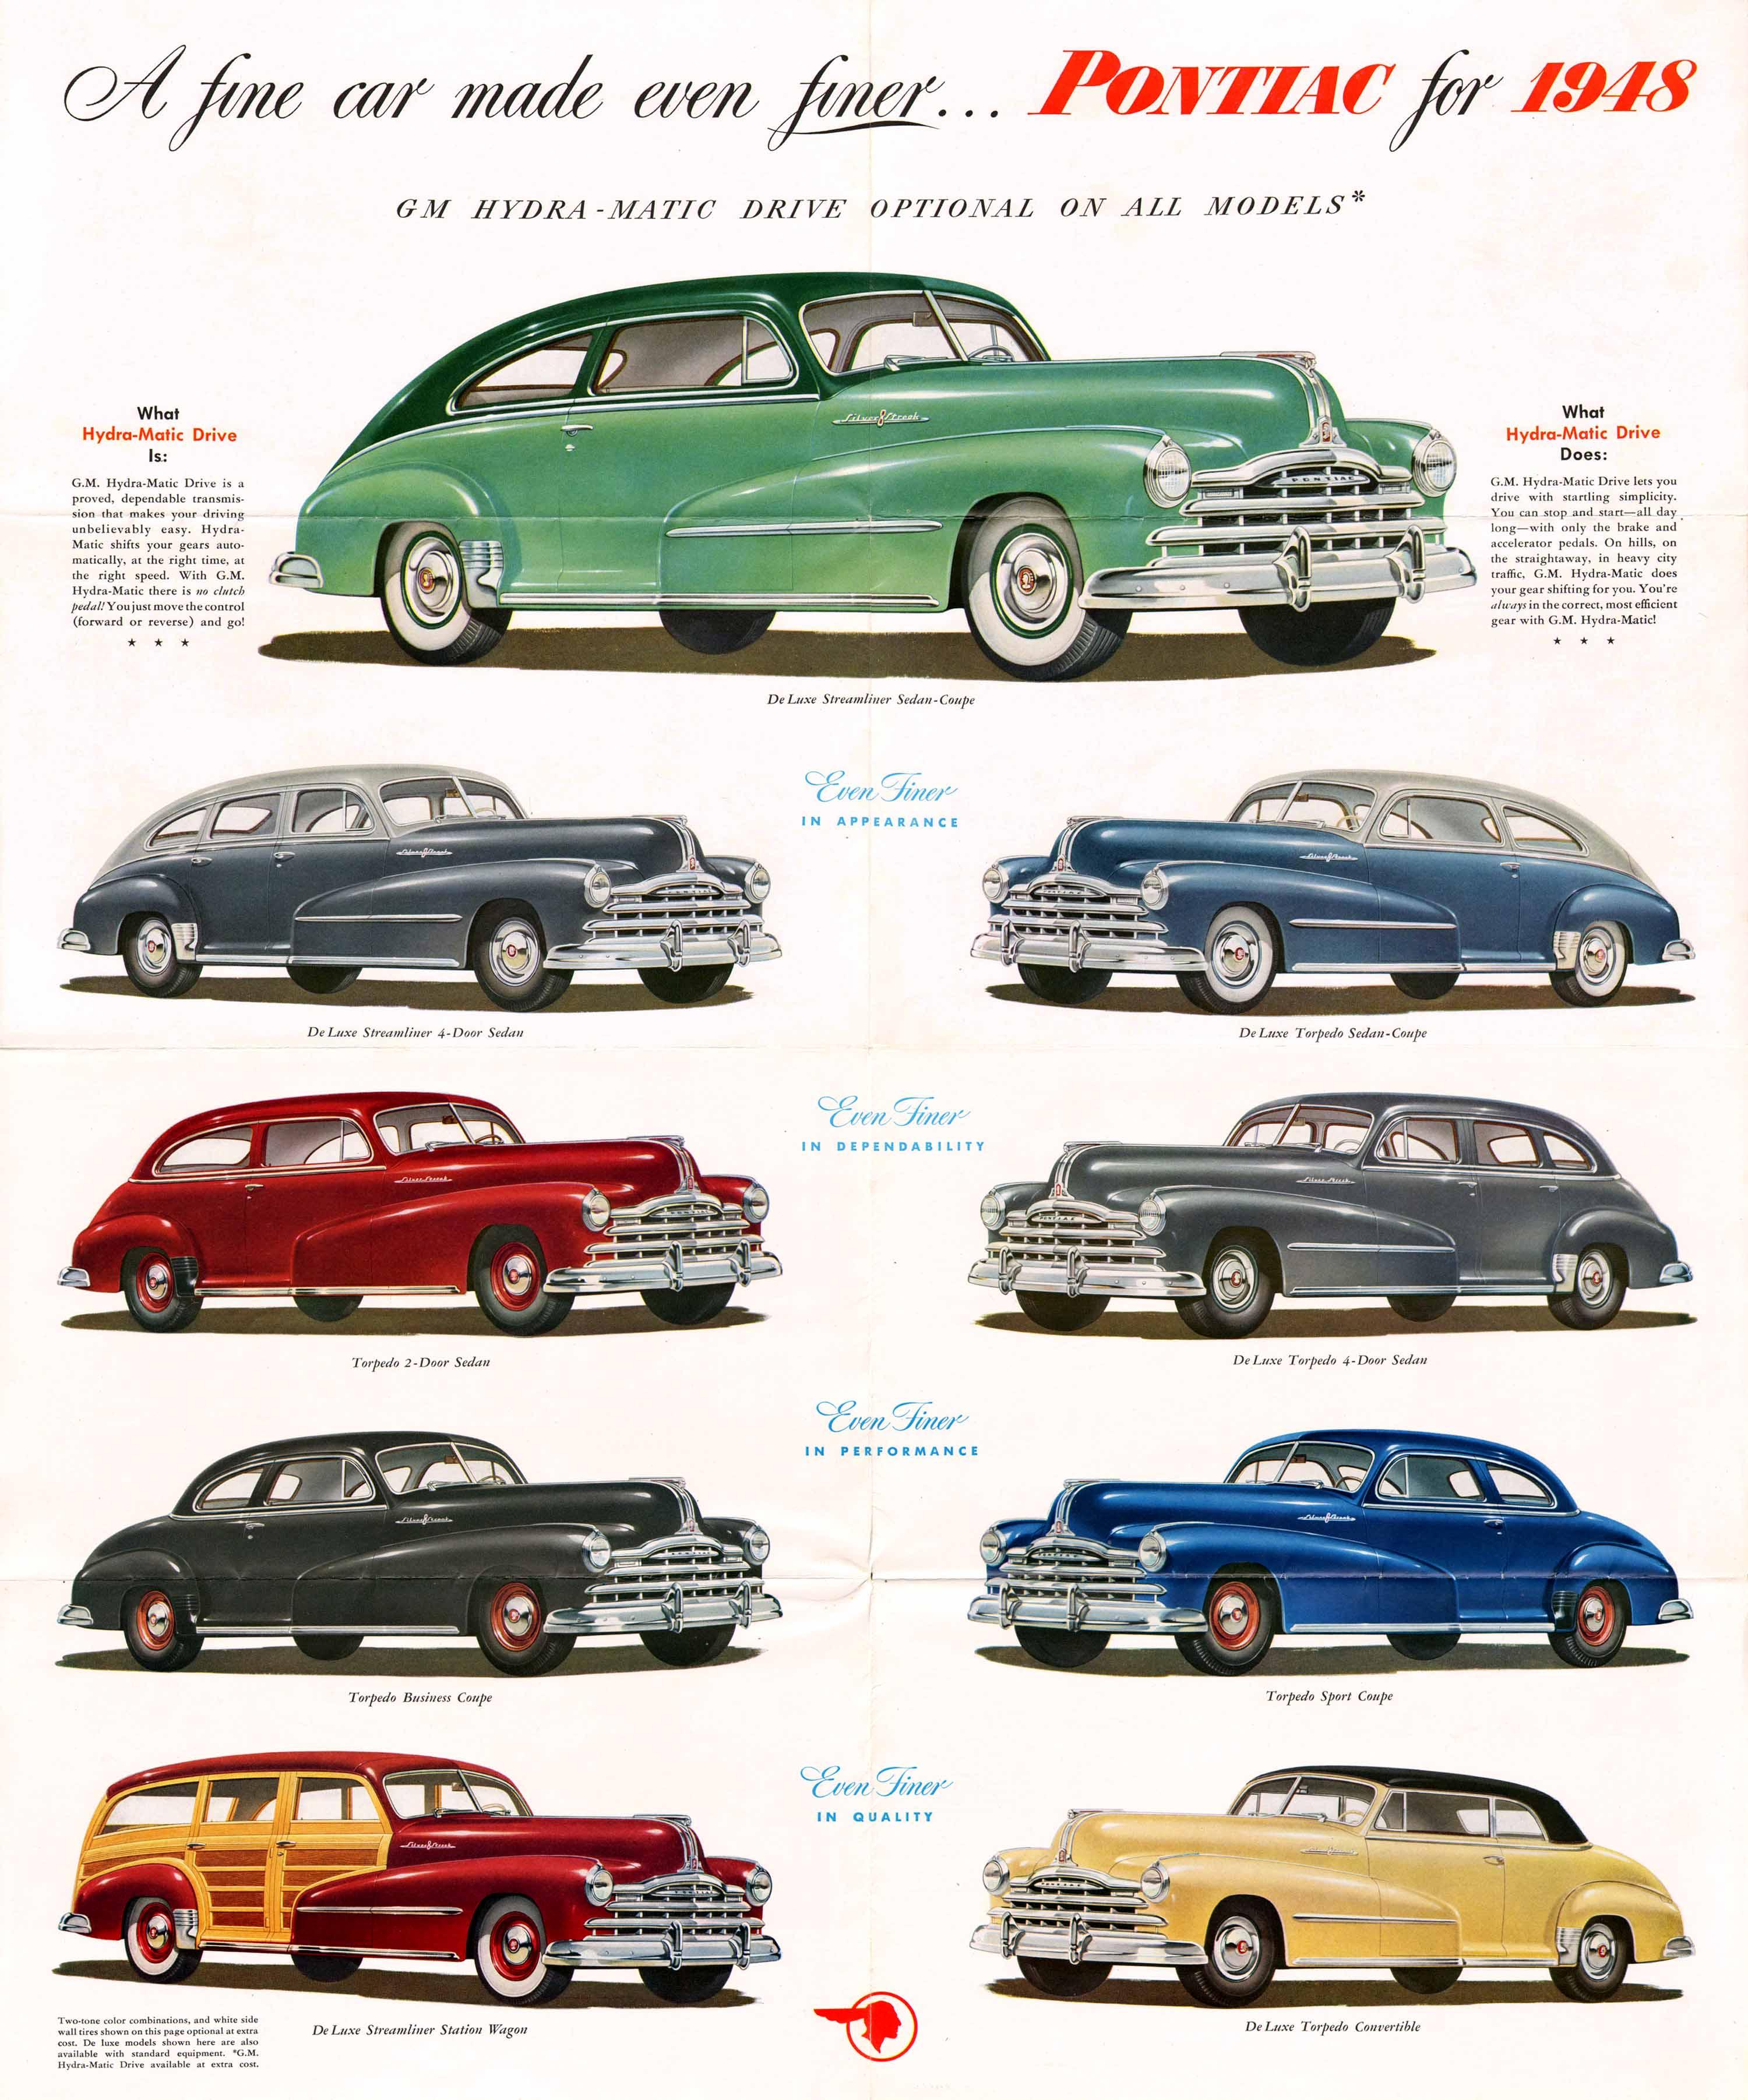 image 1948 pontiac foldout 1948 pontiac foldout 08 09 10 11 12 13 14 15